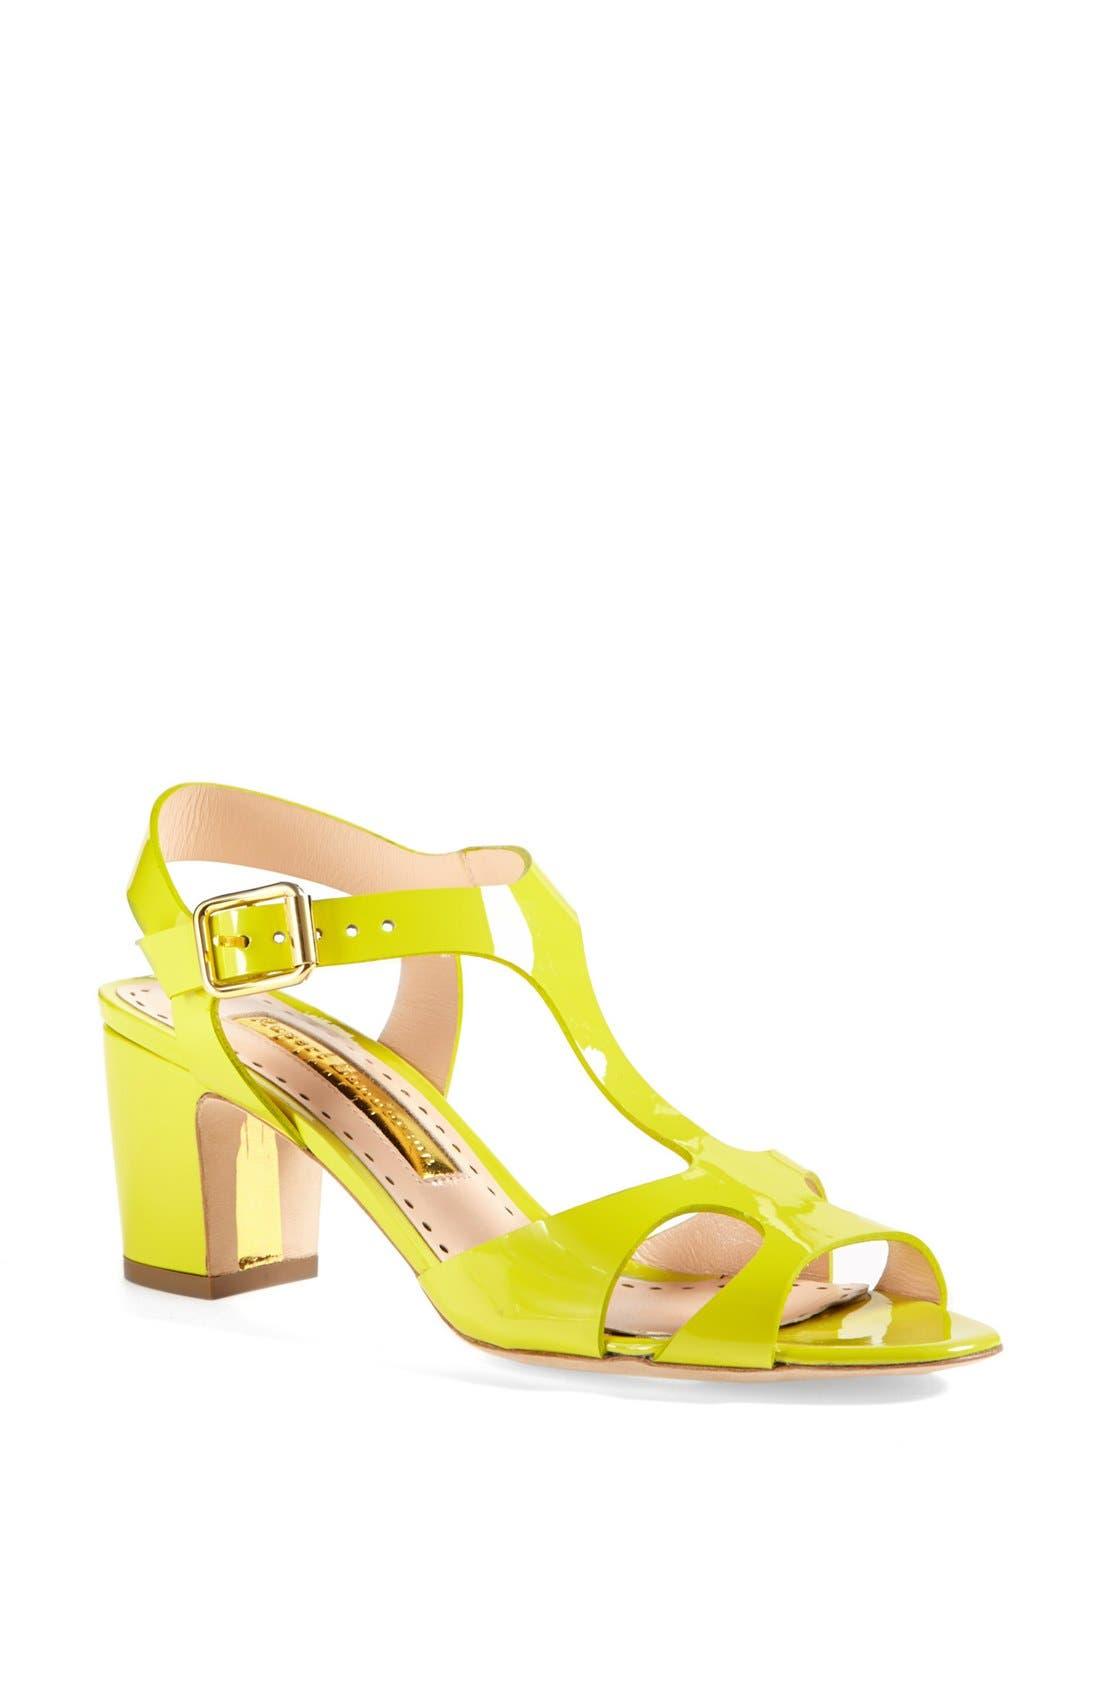 Main Image - Rupert Sanderson 'Ischia' Patent Leather Sandal